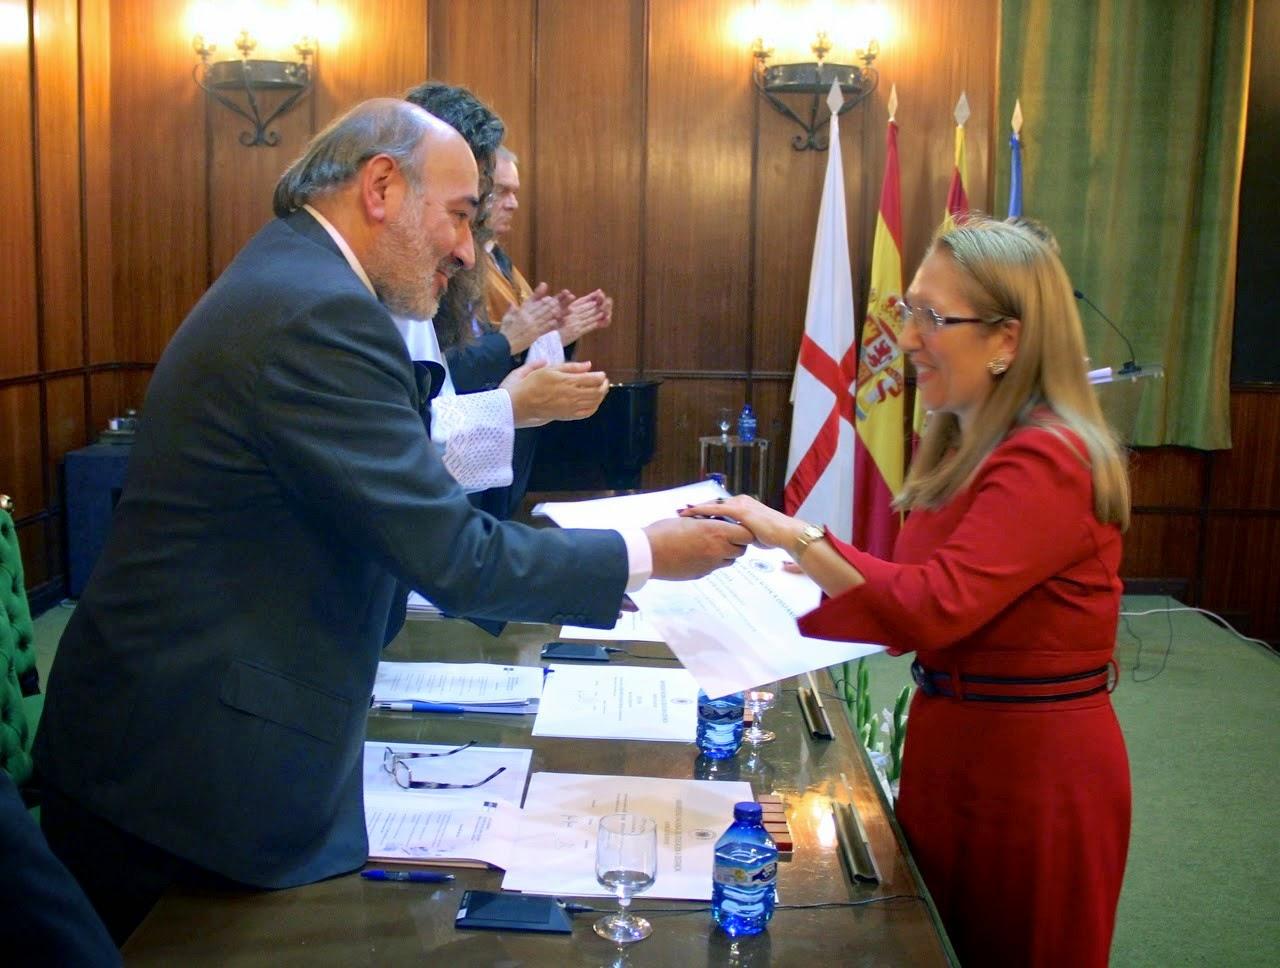 Recibiendo el diploma e insignia de manos de D. José Manuel Aranda, alcalde de  Calatayud